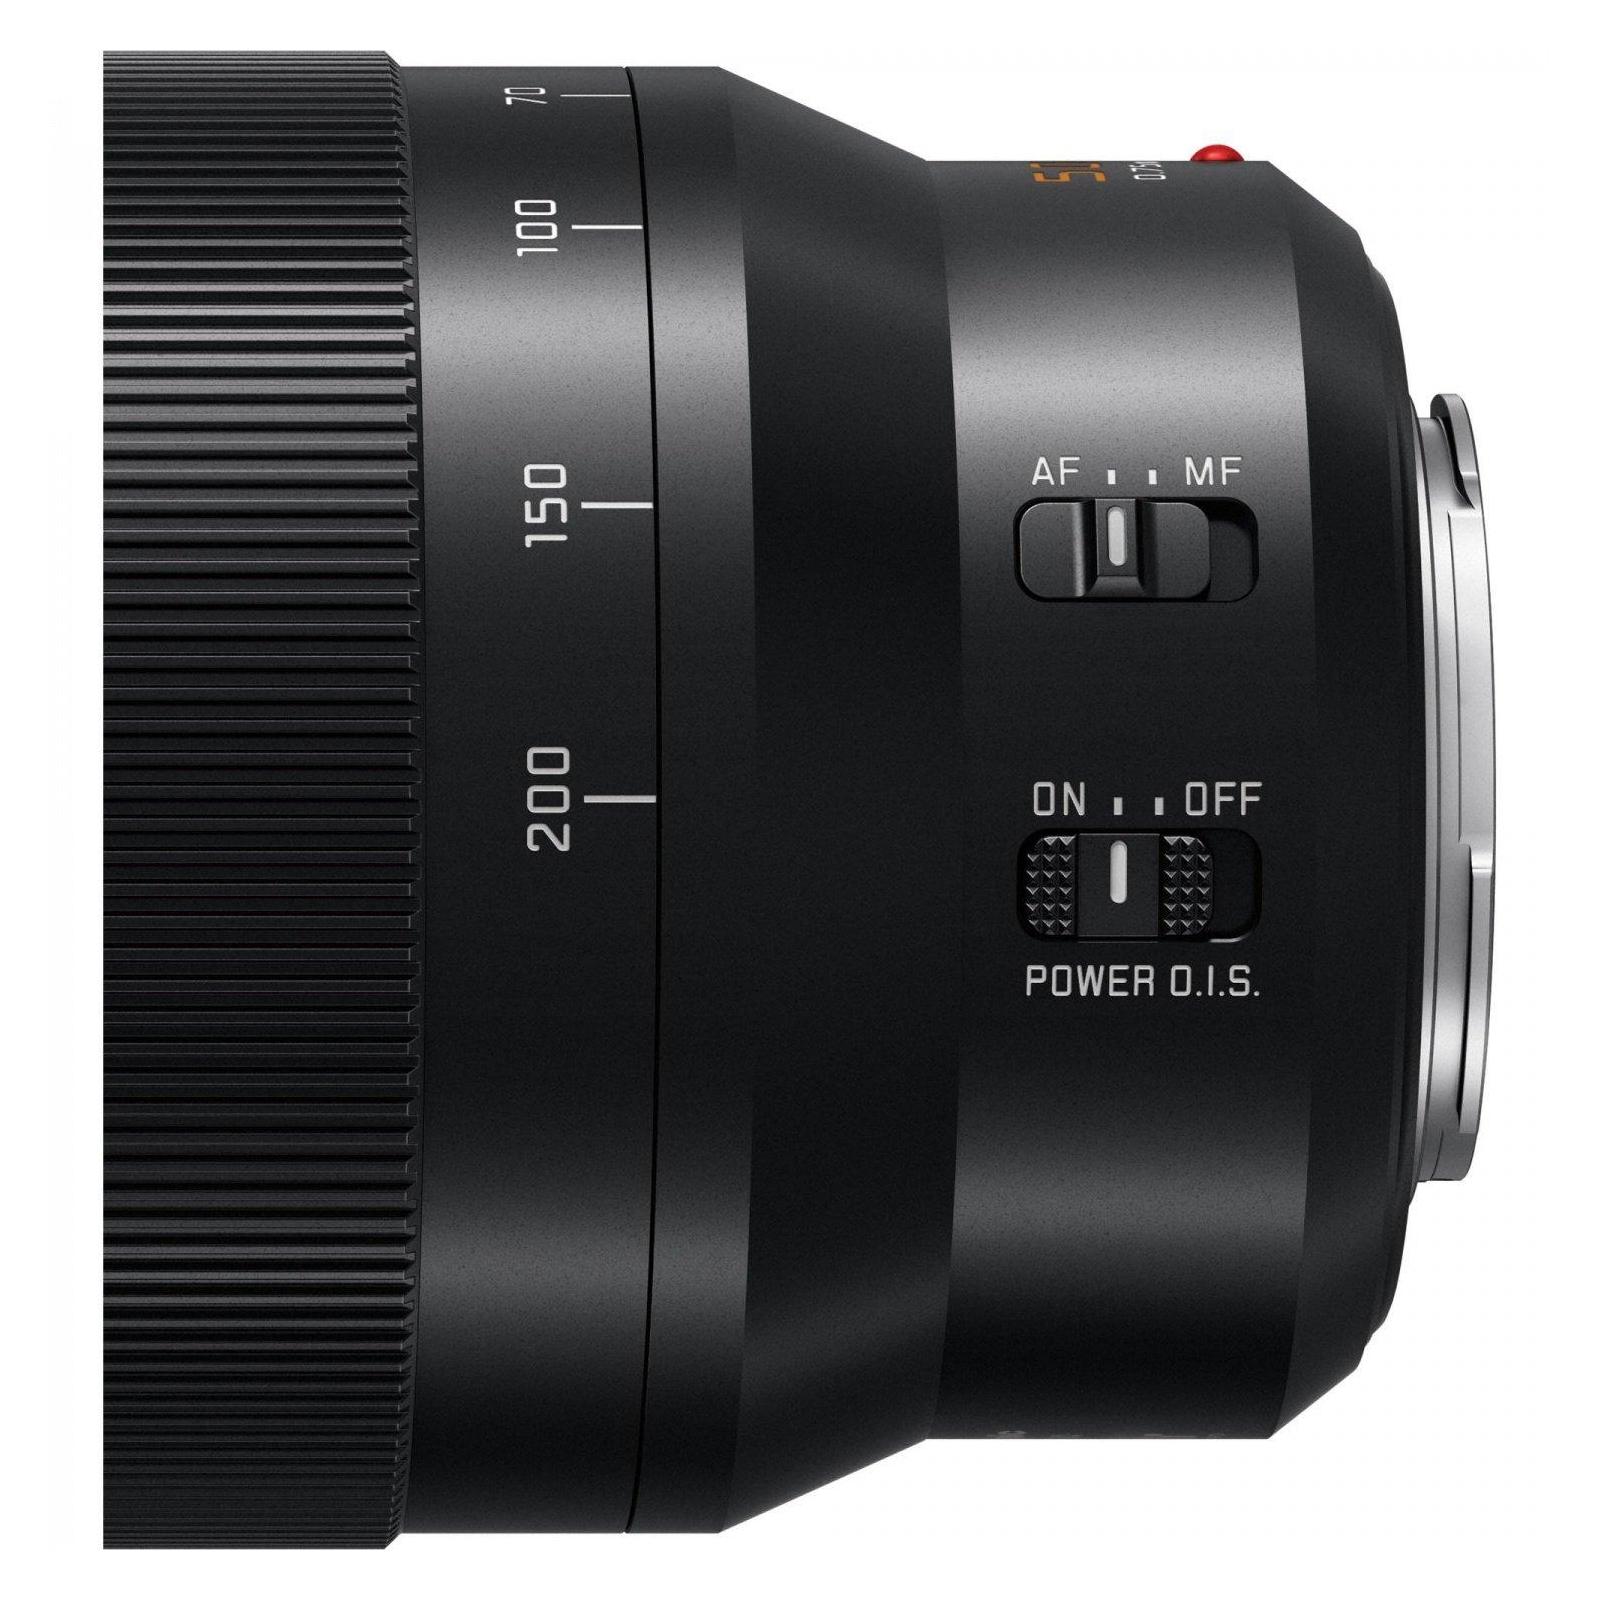 Объектив PANASONIC Micro 4/3 Lens 50-200 mm f/2.8-4 ASPH. POWER O.I.S. Leica DG (H-ES50200E) изображение 9